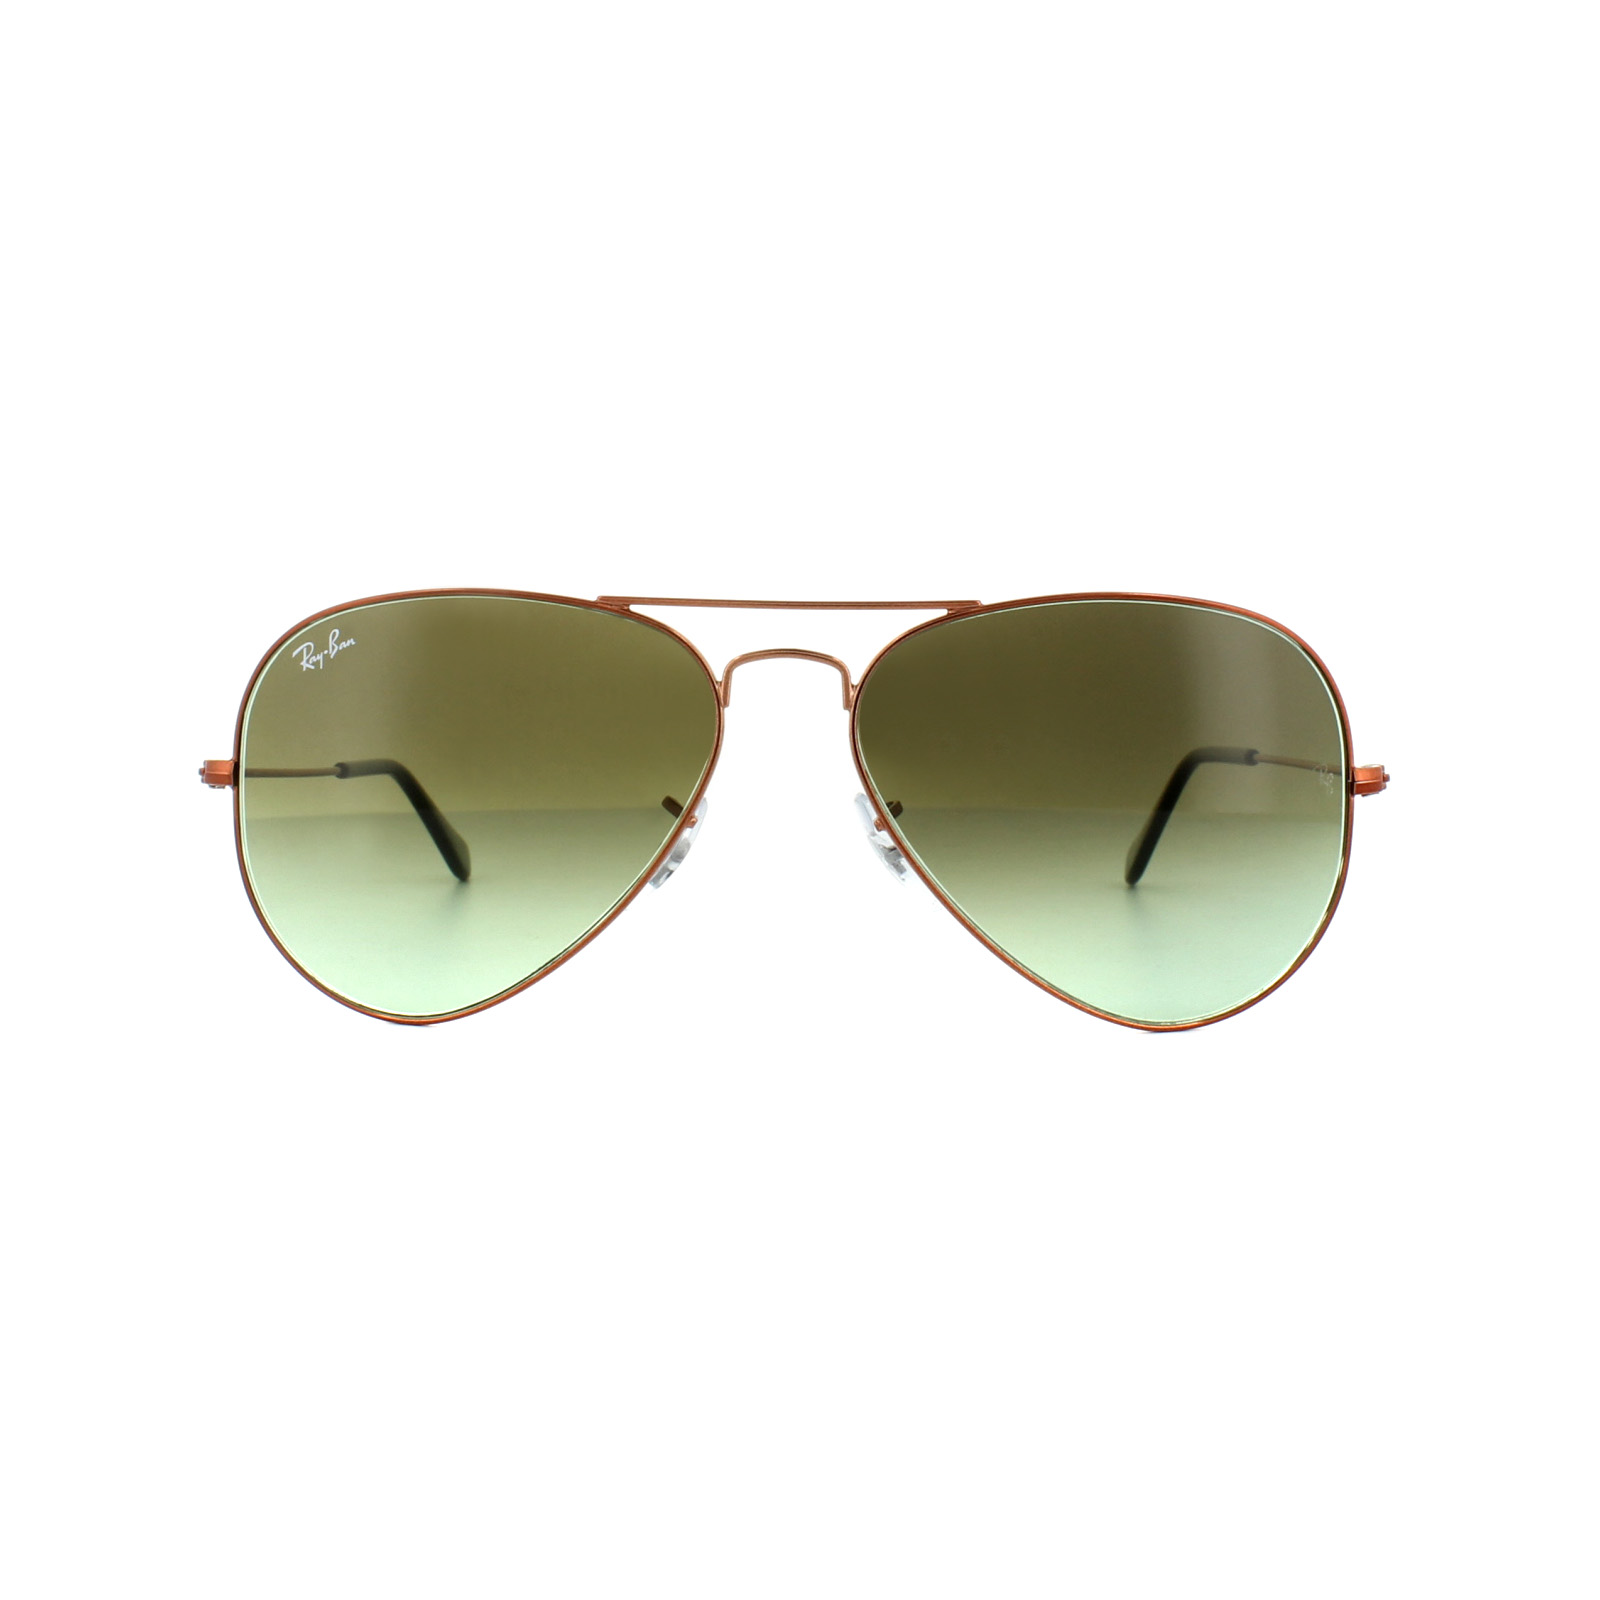 151acdd2e86 Sentinel Ray-Ban Sunglasses Aviator 3025 9002A6 Bronze Copper Green Gradient  Medium 58mm